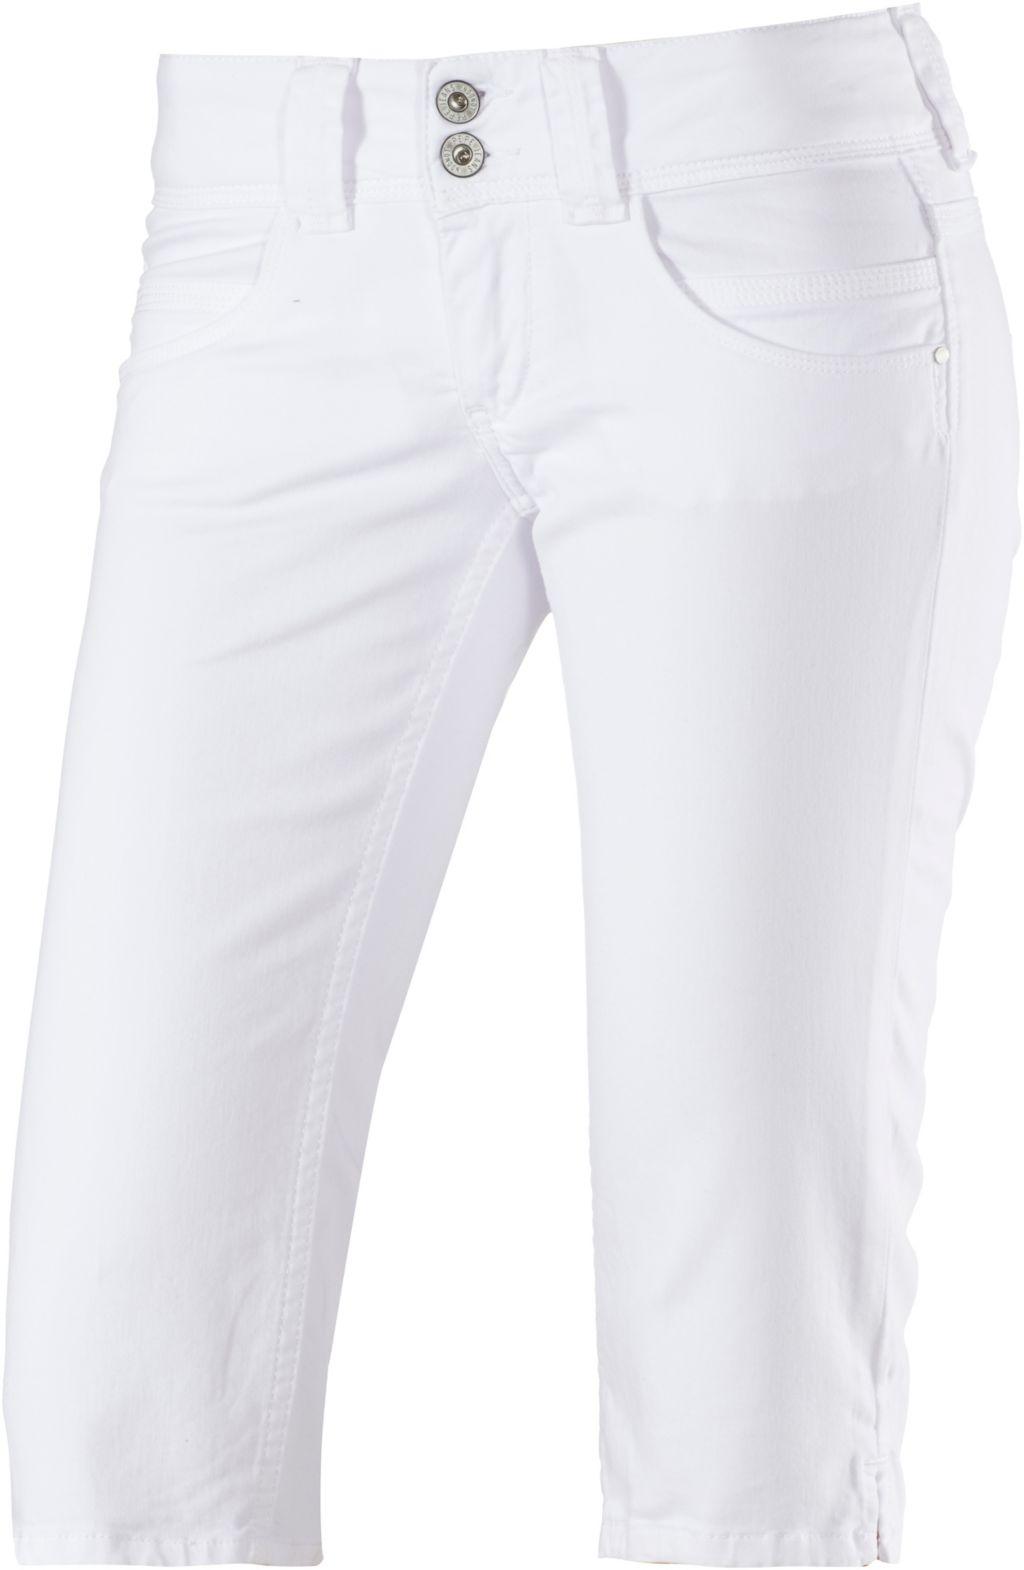 Pepe Jeans Venus 3/4-Jeans Damen in weiß, Größe: 27